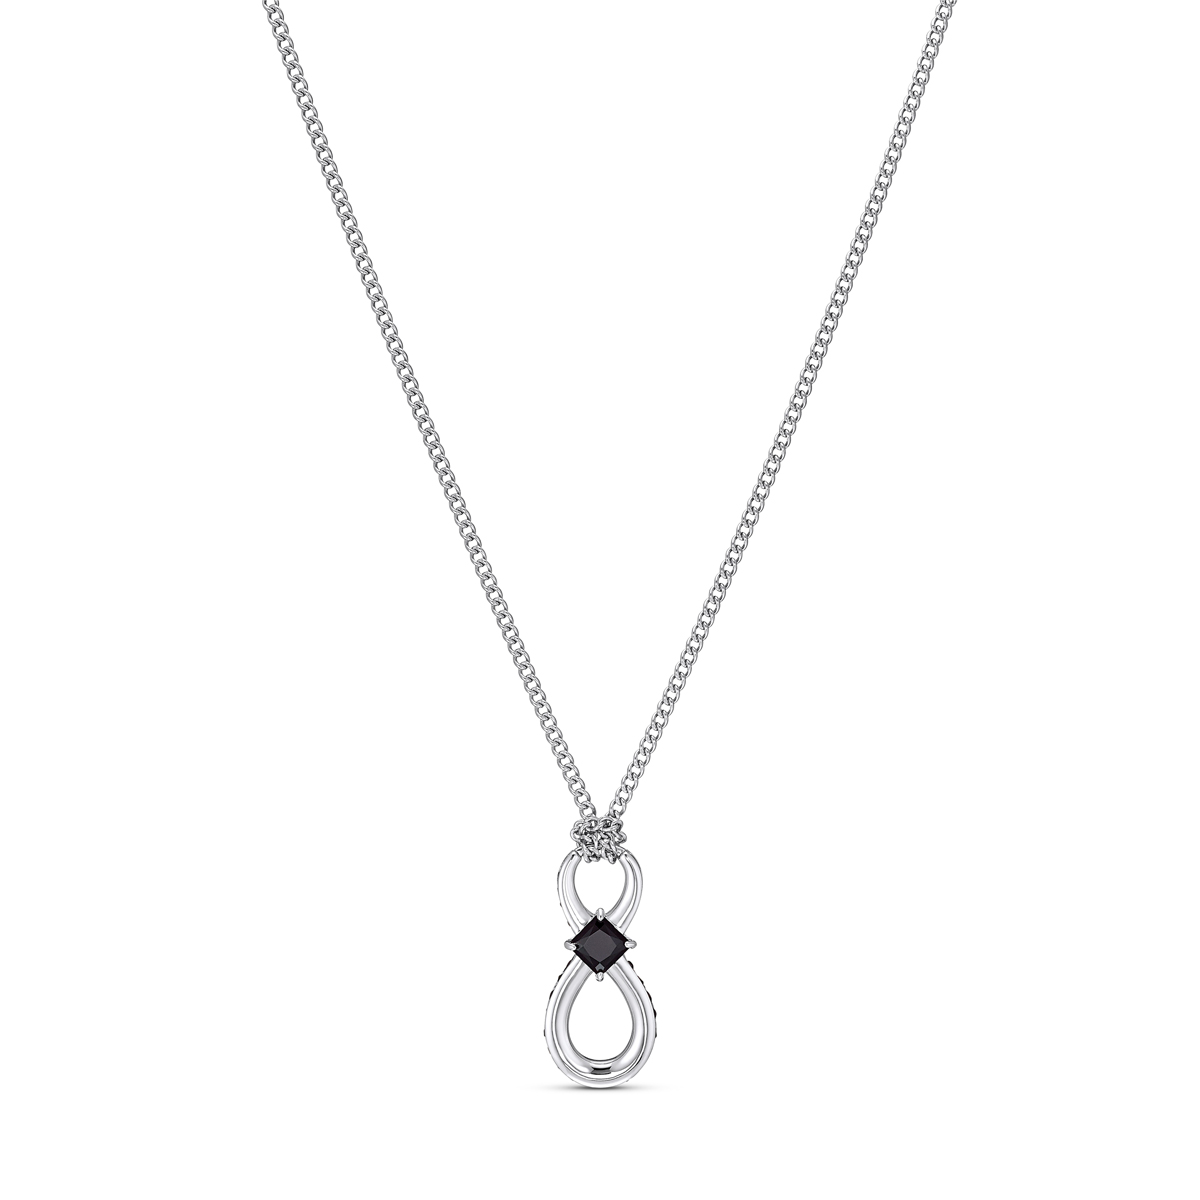 Swarovski Infinity Pendant Necklace Jet Rhodium Silver